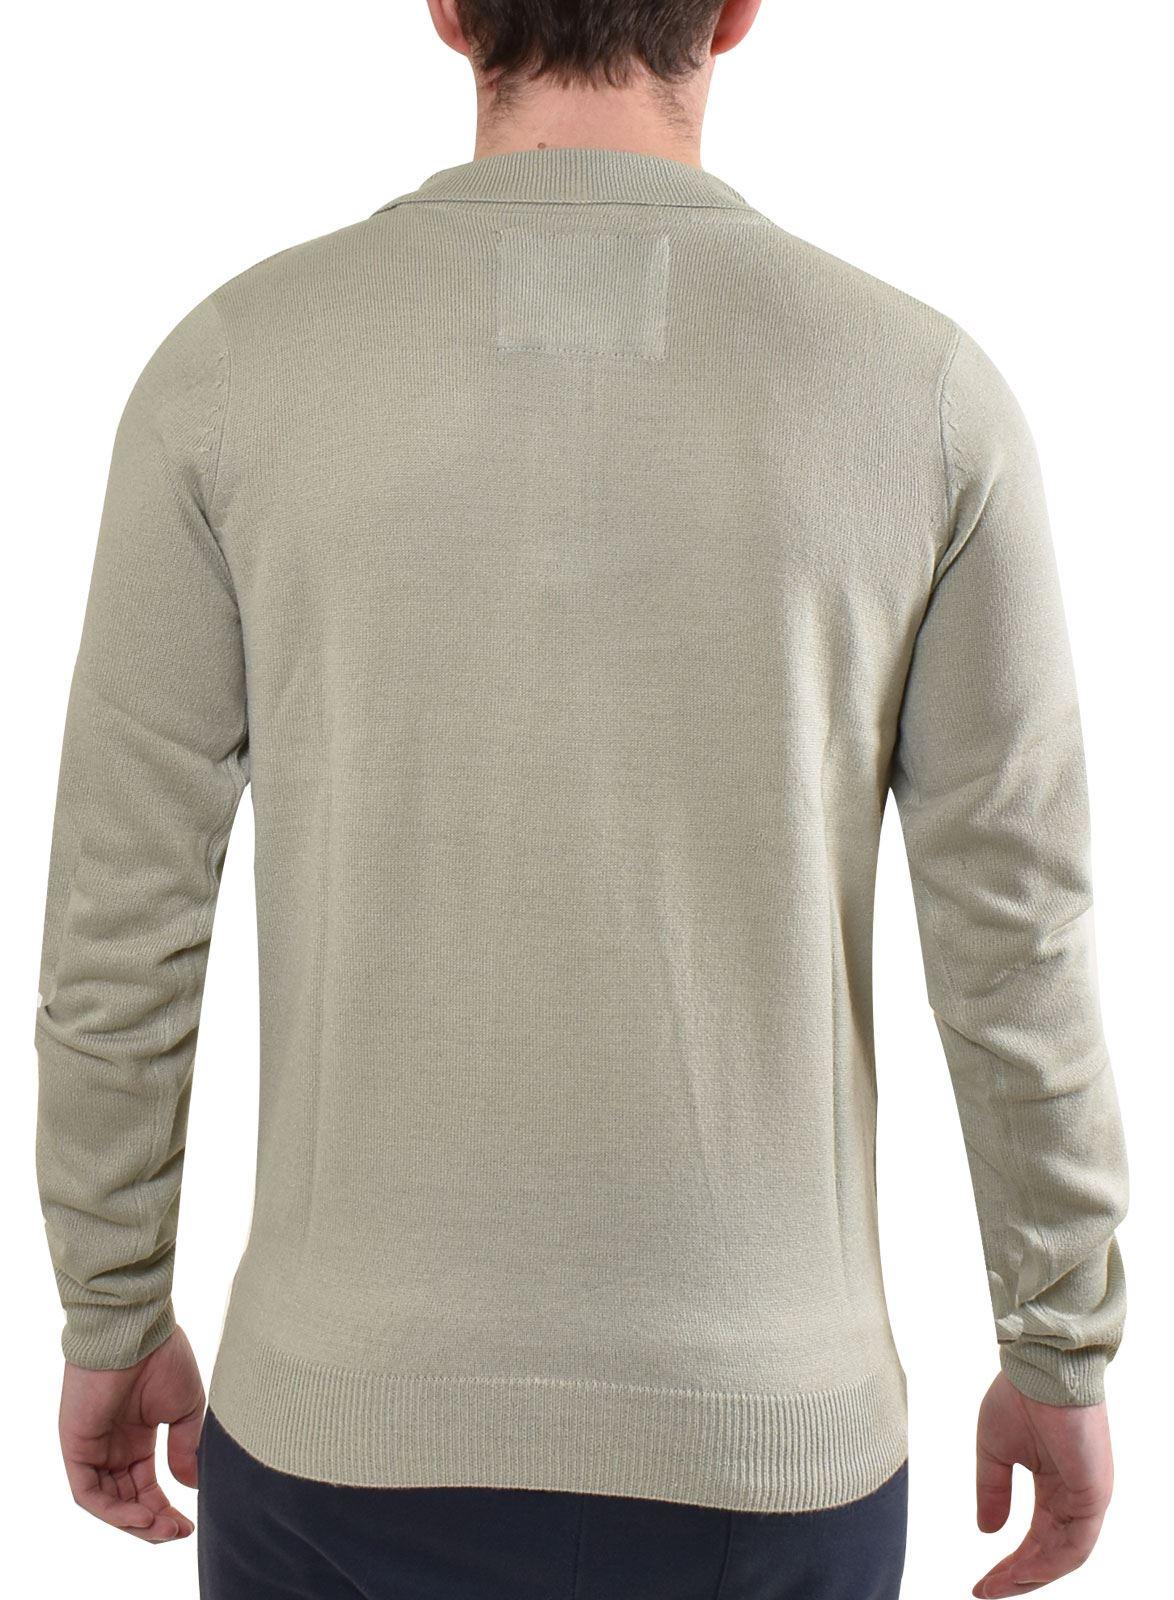 Mens Polo Tee Shirt Long Sleeves Cotton Plain Regular Fit Ribbed Cuff Top